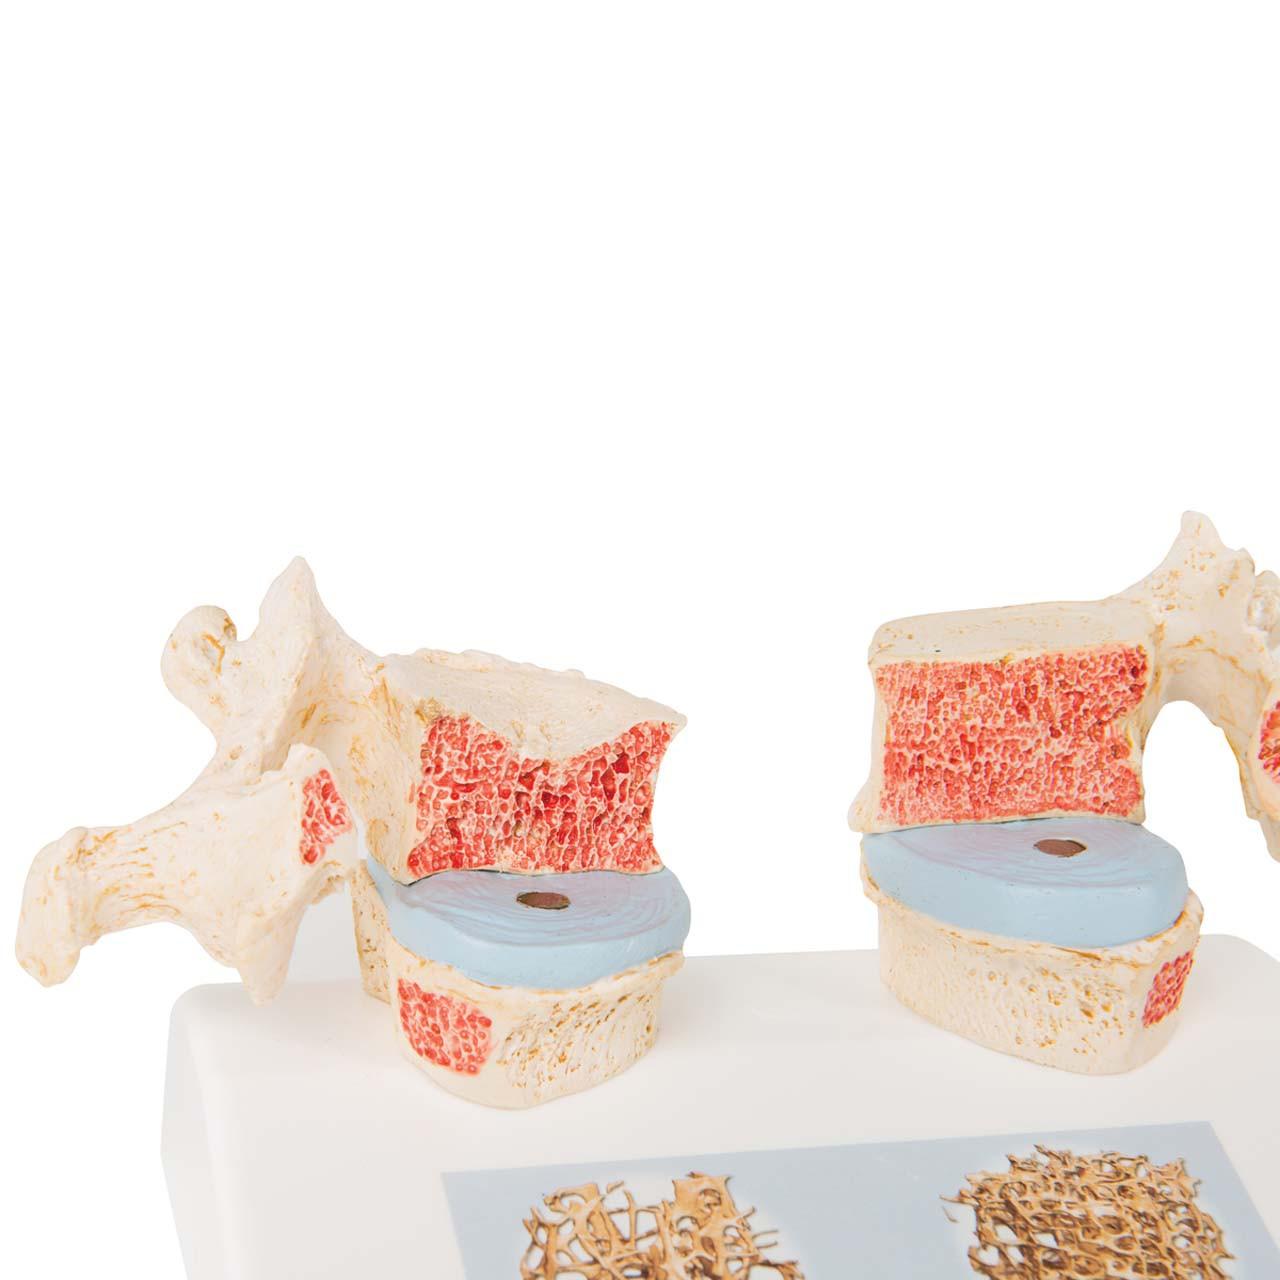 1000182 - Osteoporosis Model